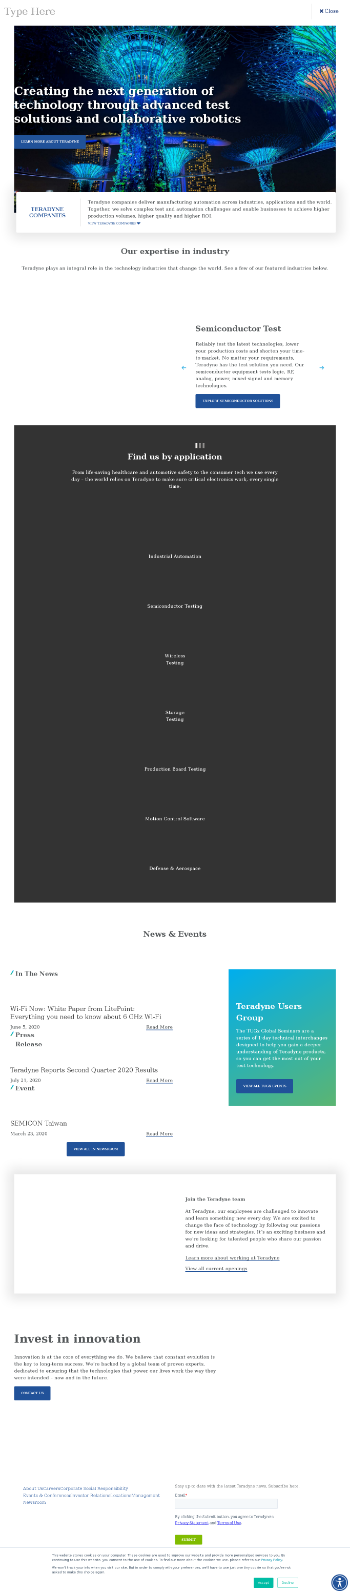 Teradyne, Inc. Website Screenshot